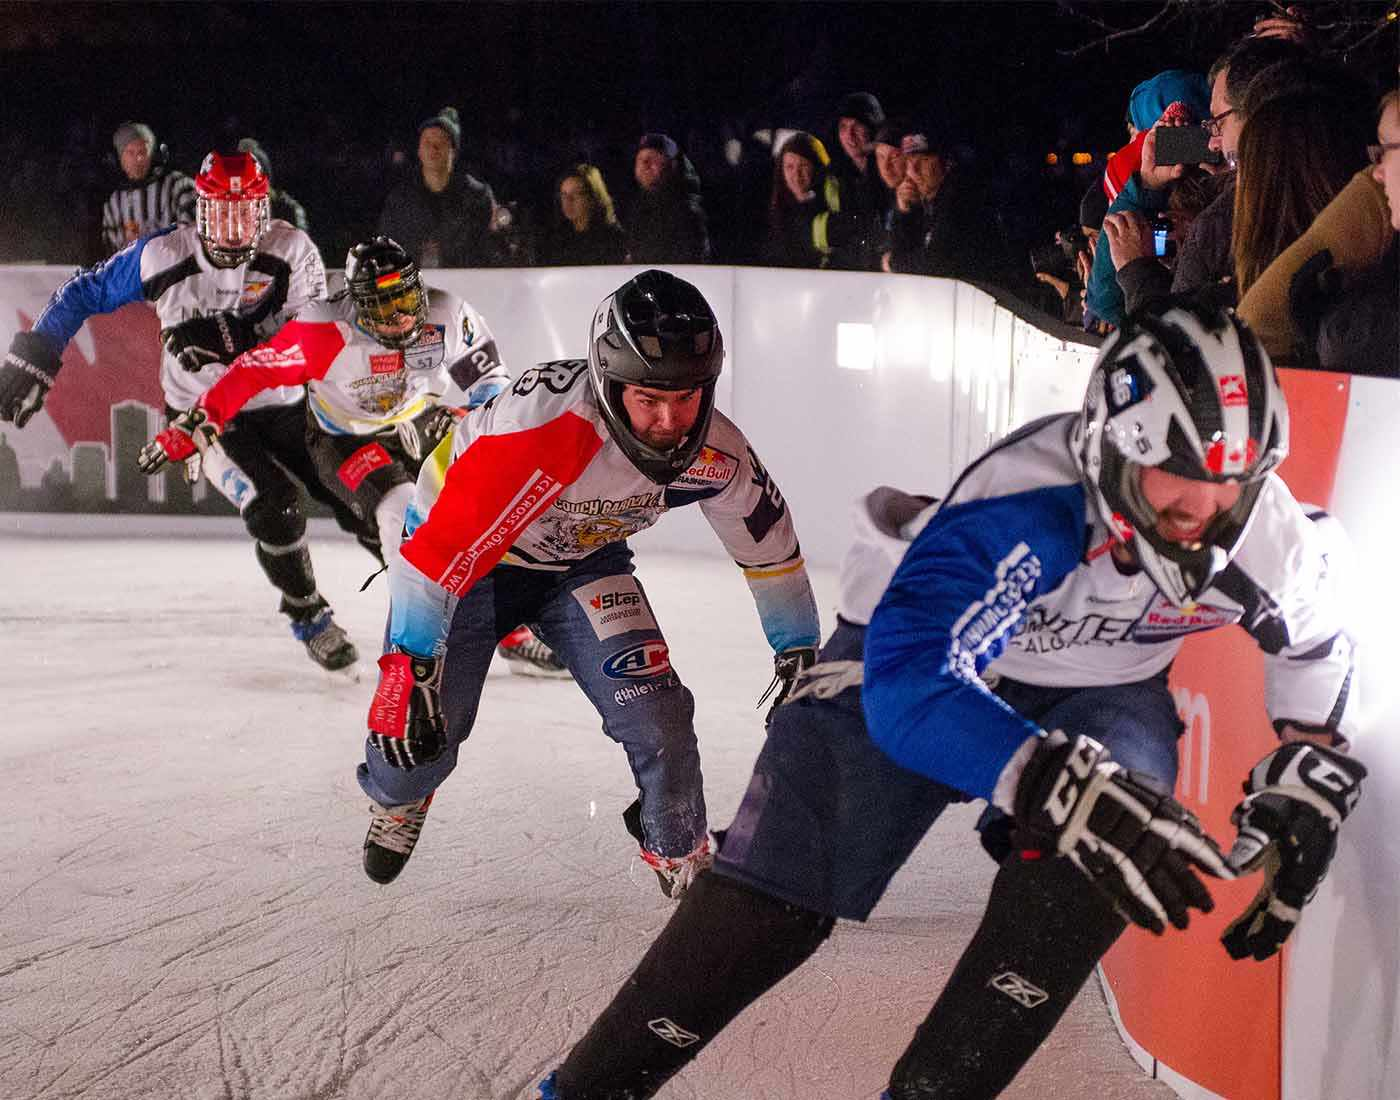 Ice Cross Downhill